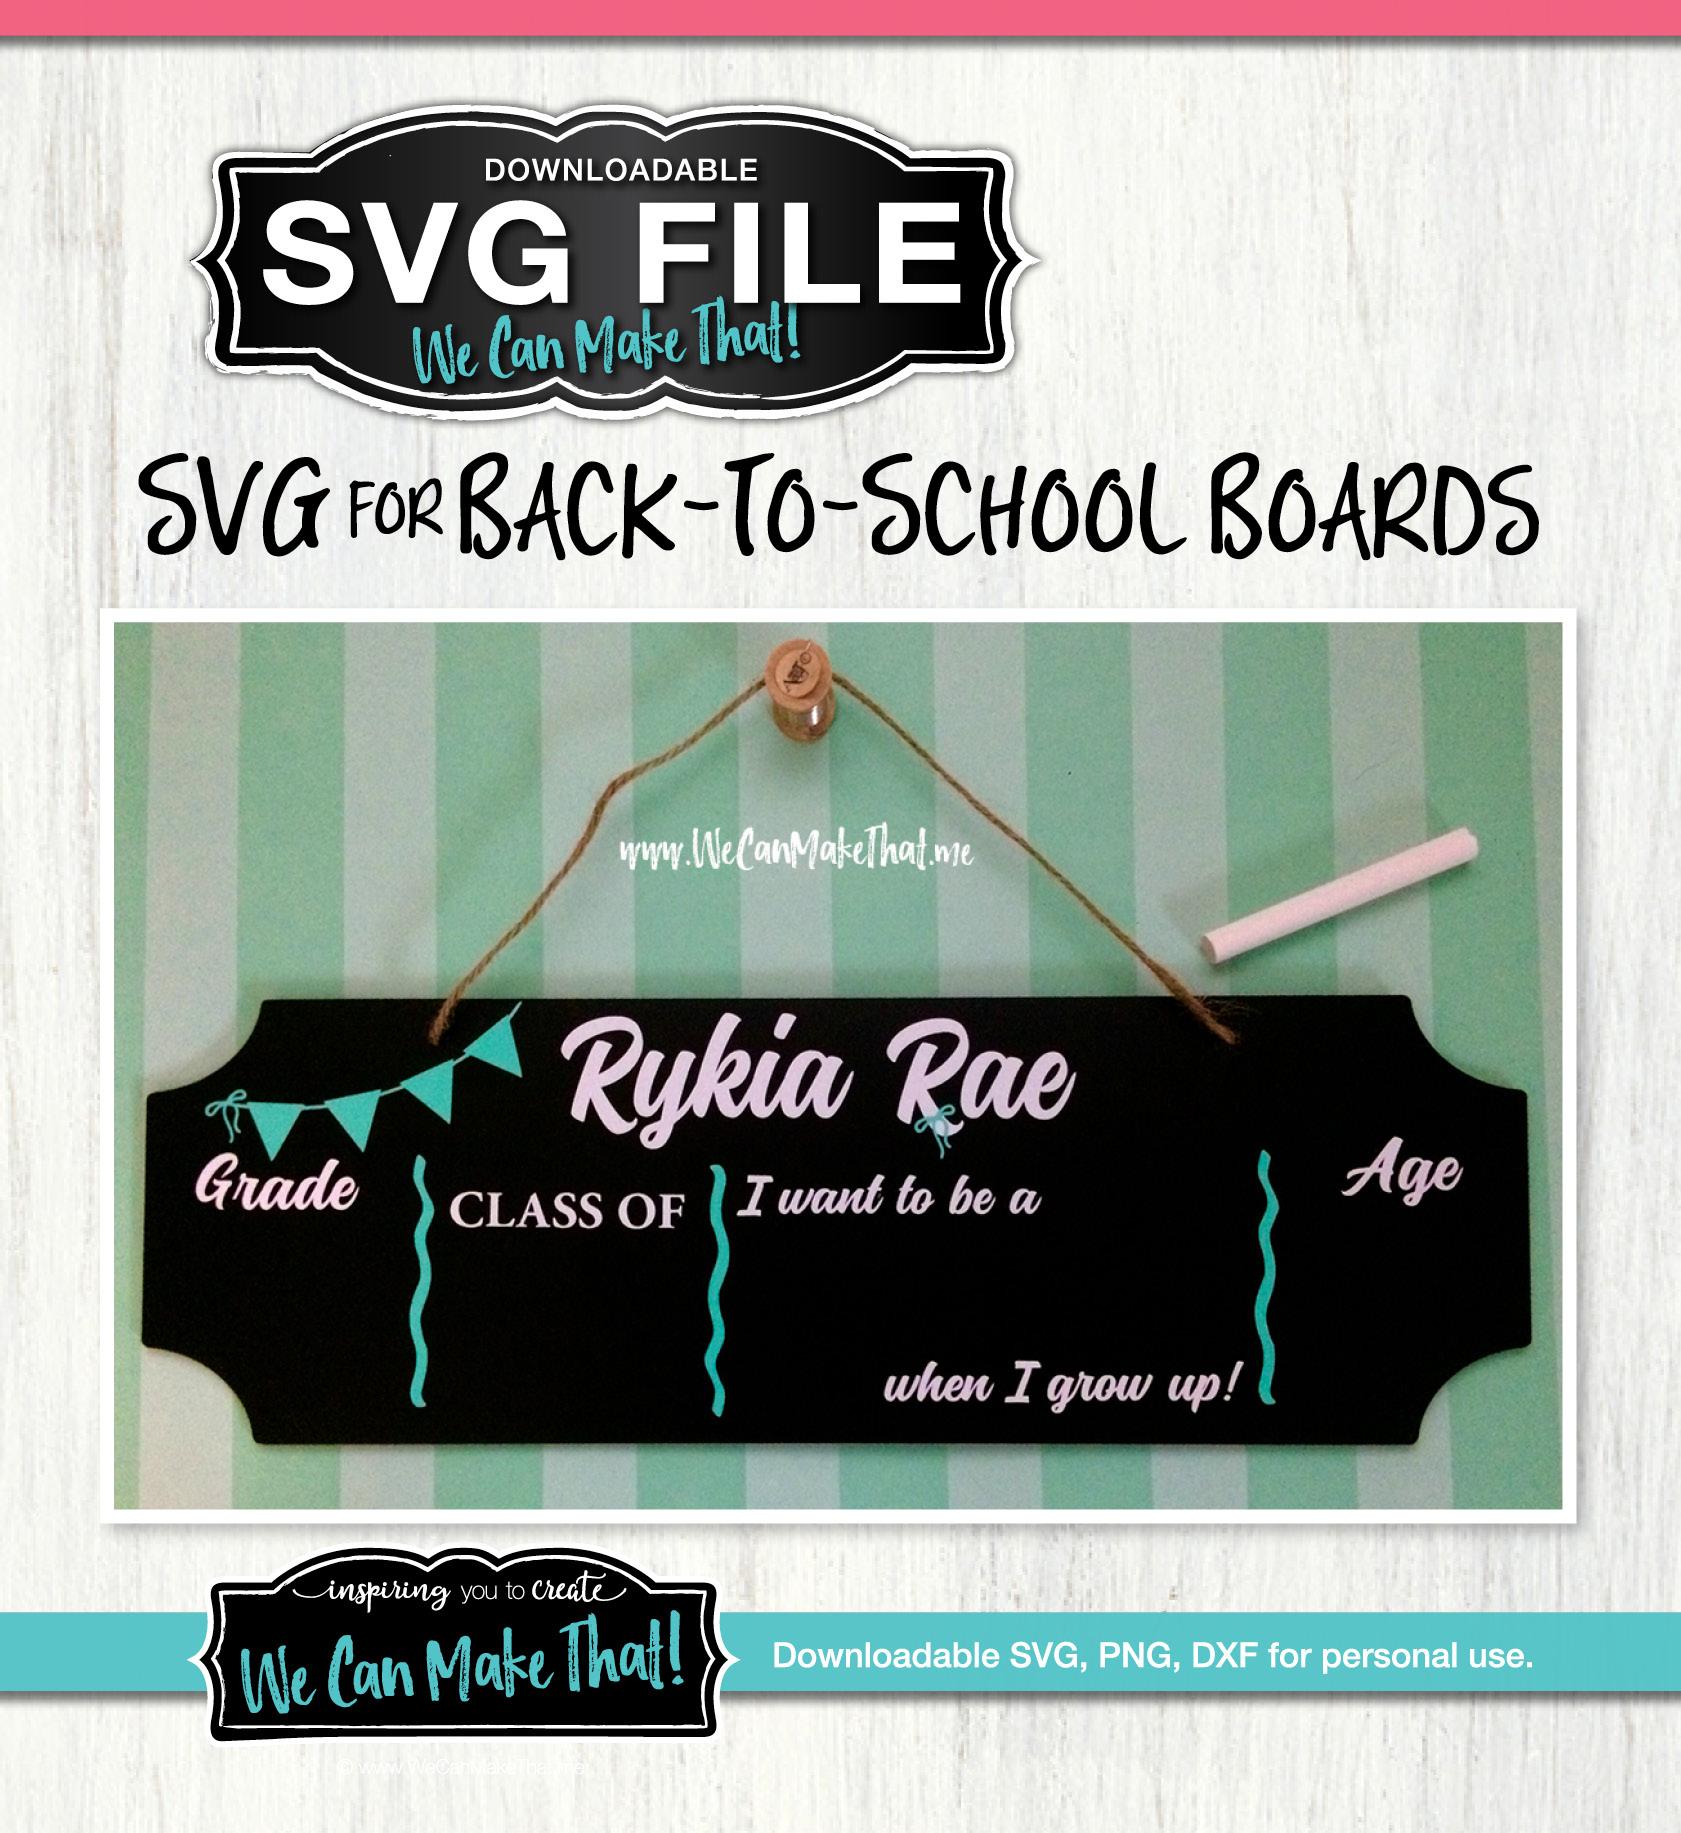 Back to school boards SVG File